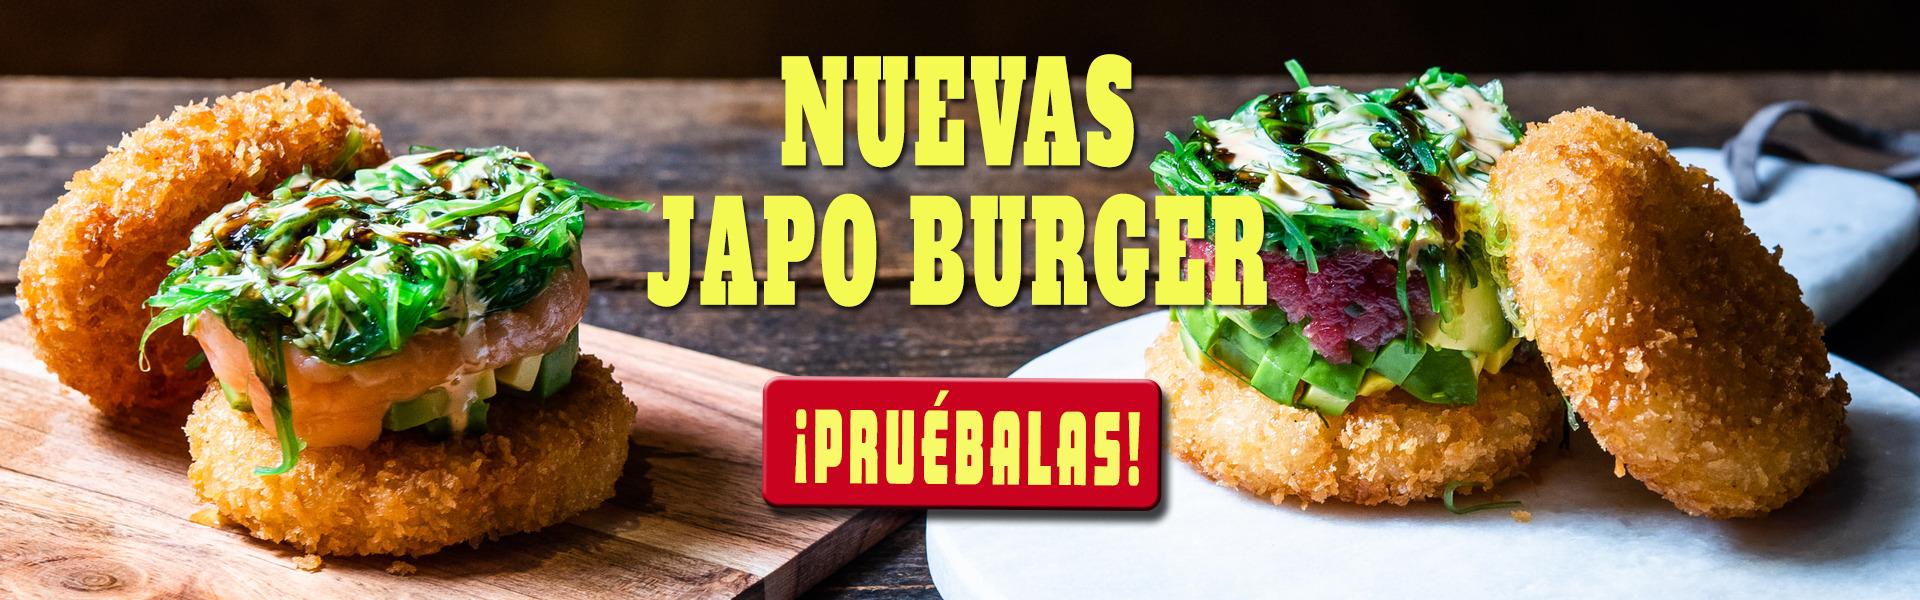 Japo Burgers